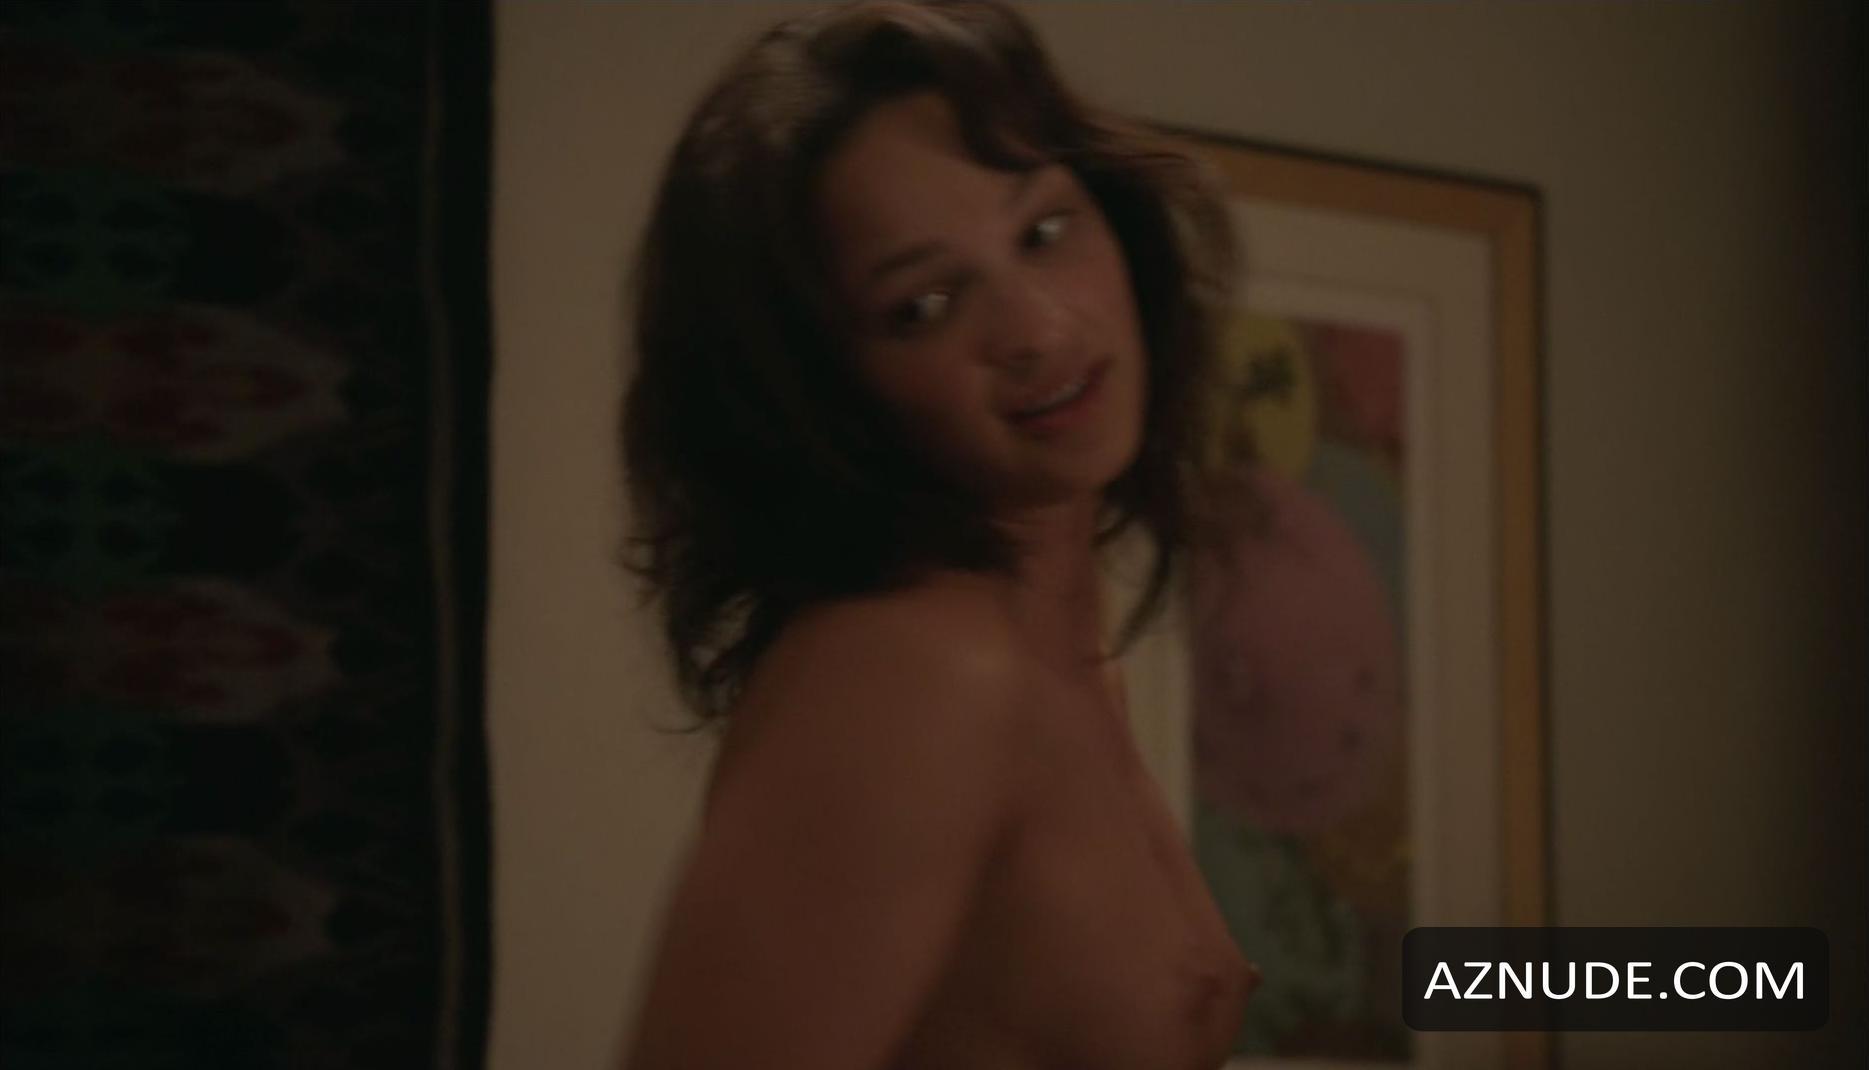 Nude women in gainesville georgia